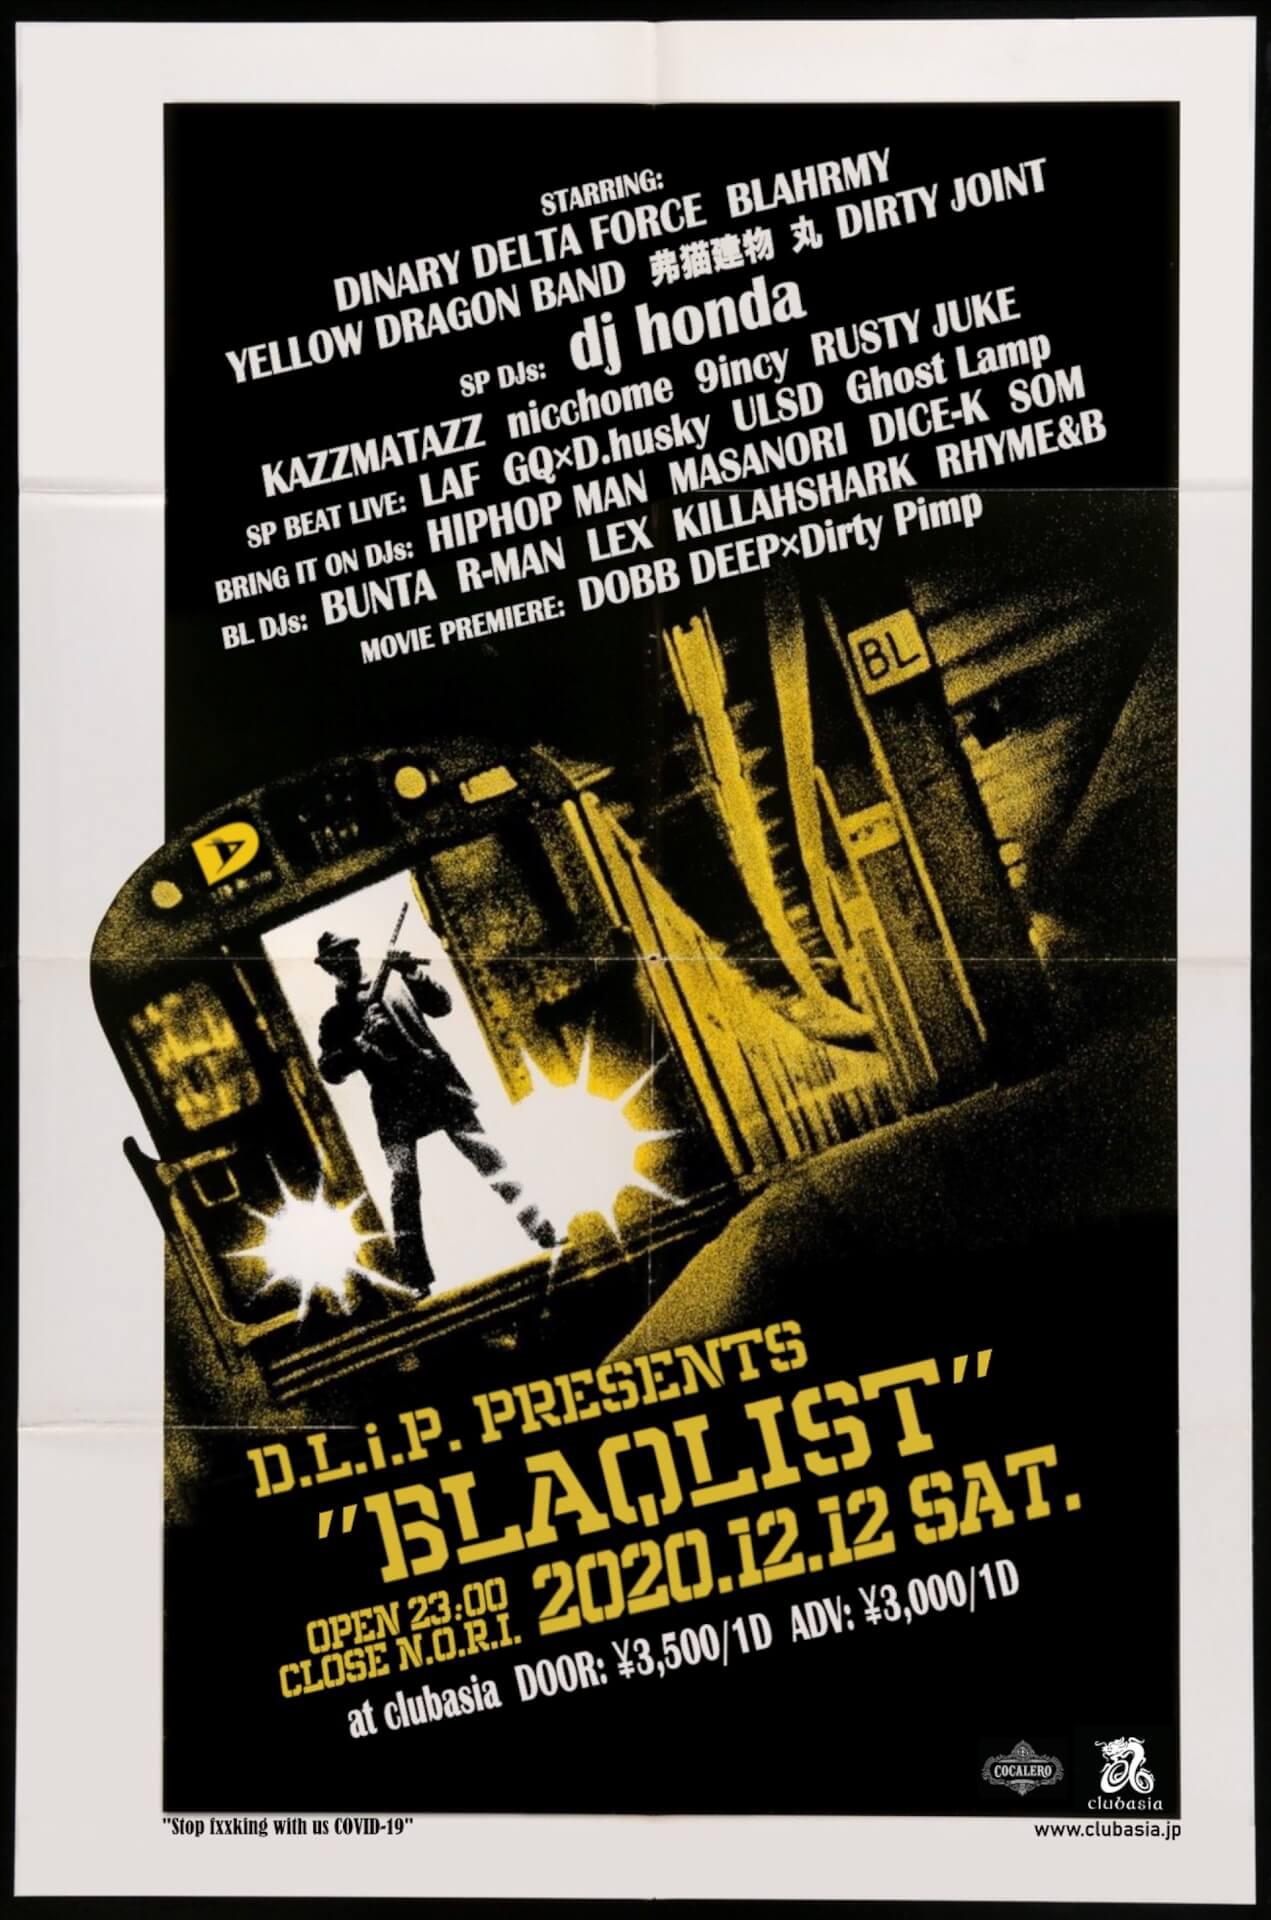 BLAHRMYによる12インチシングル『B.A.R.S.』のリリースが決定!〈DLiP RECORDS〉の恒例イベント<BLAQLIST>にはdj hondaも登場 music201130_blahrmy_1